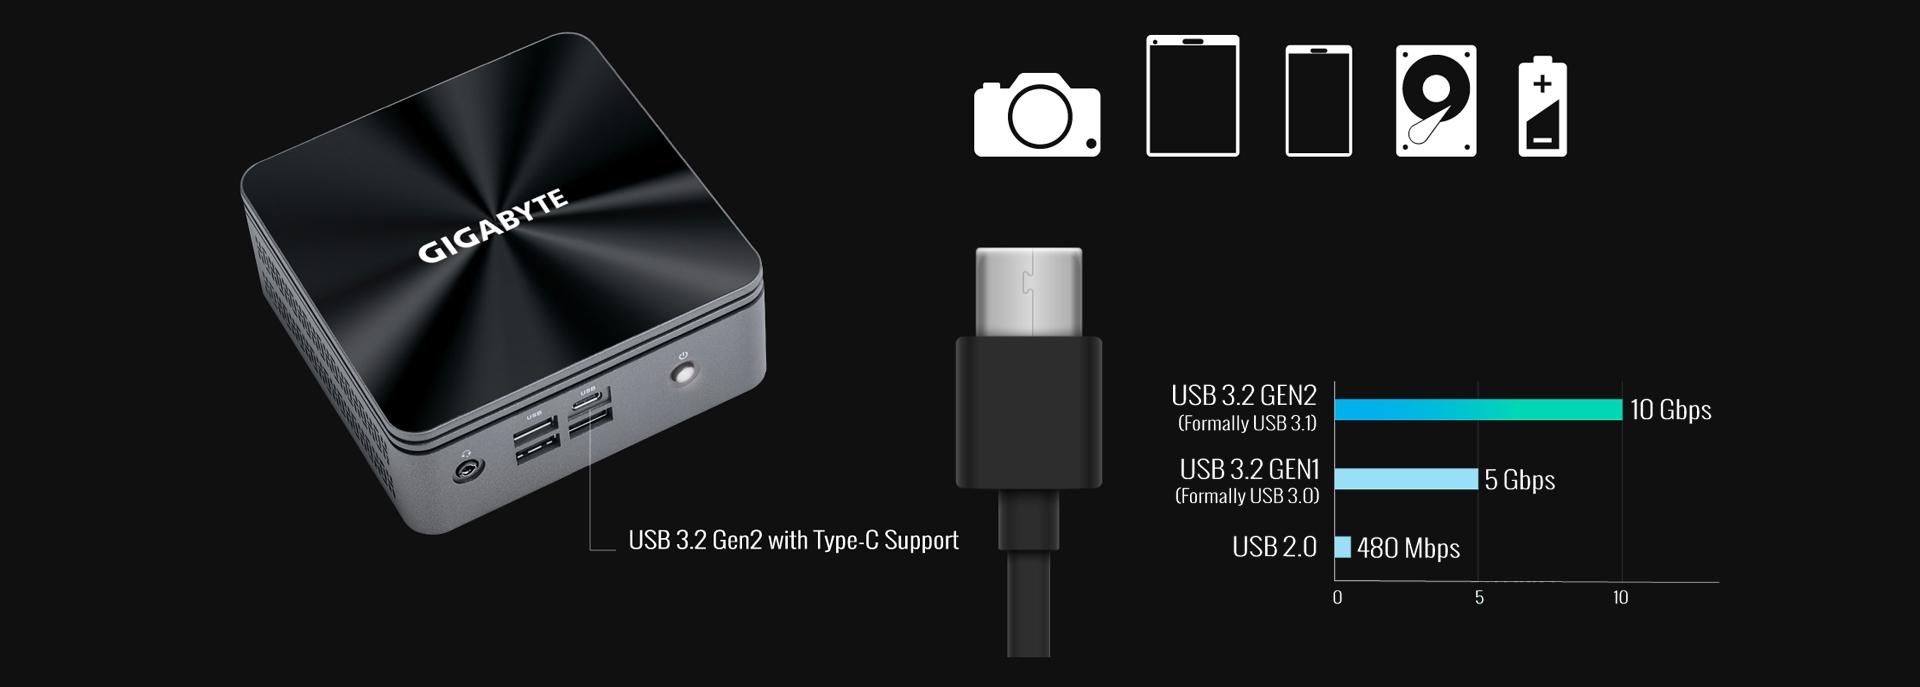 USB 3.2 Gen2 Benchmark